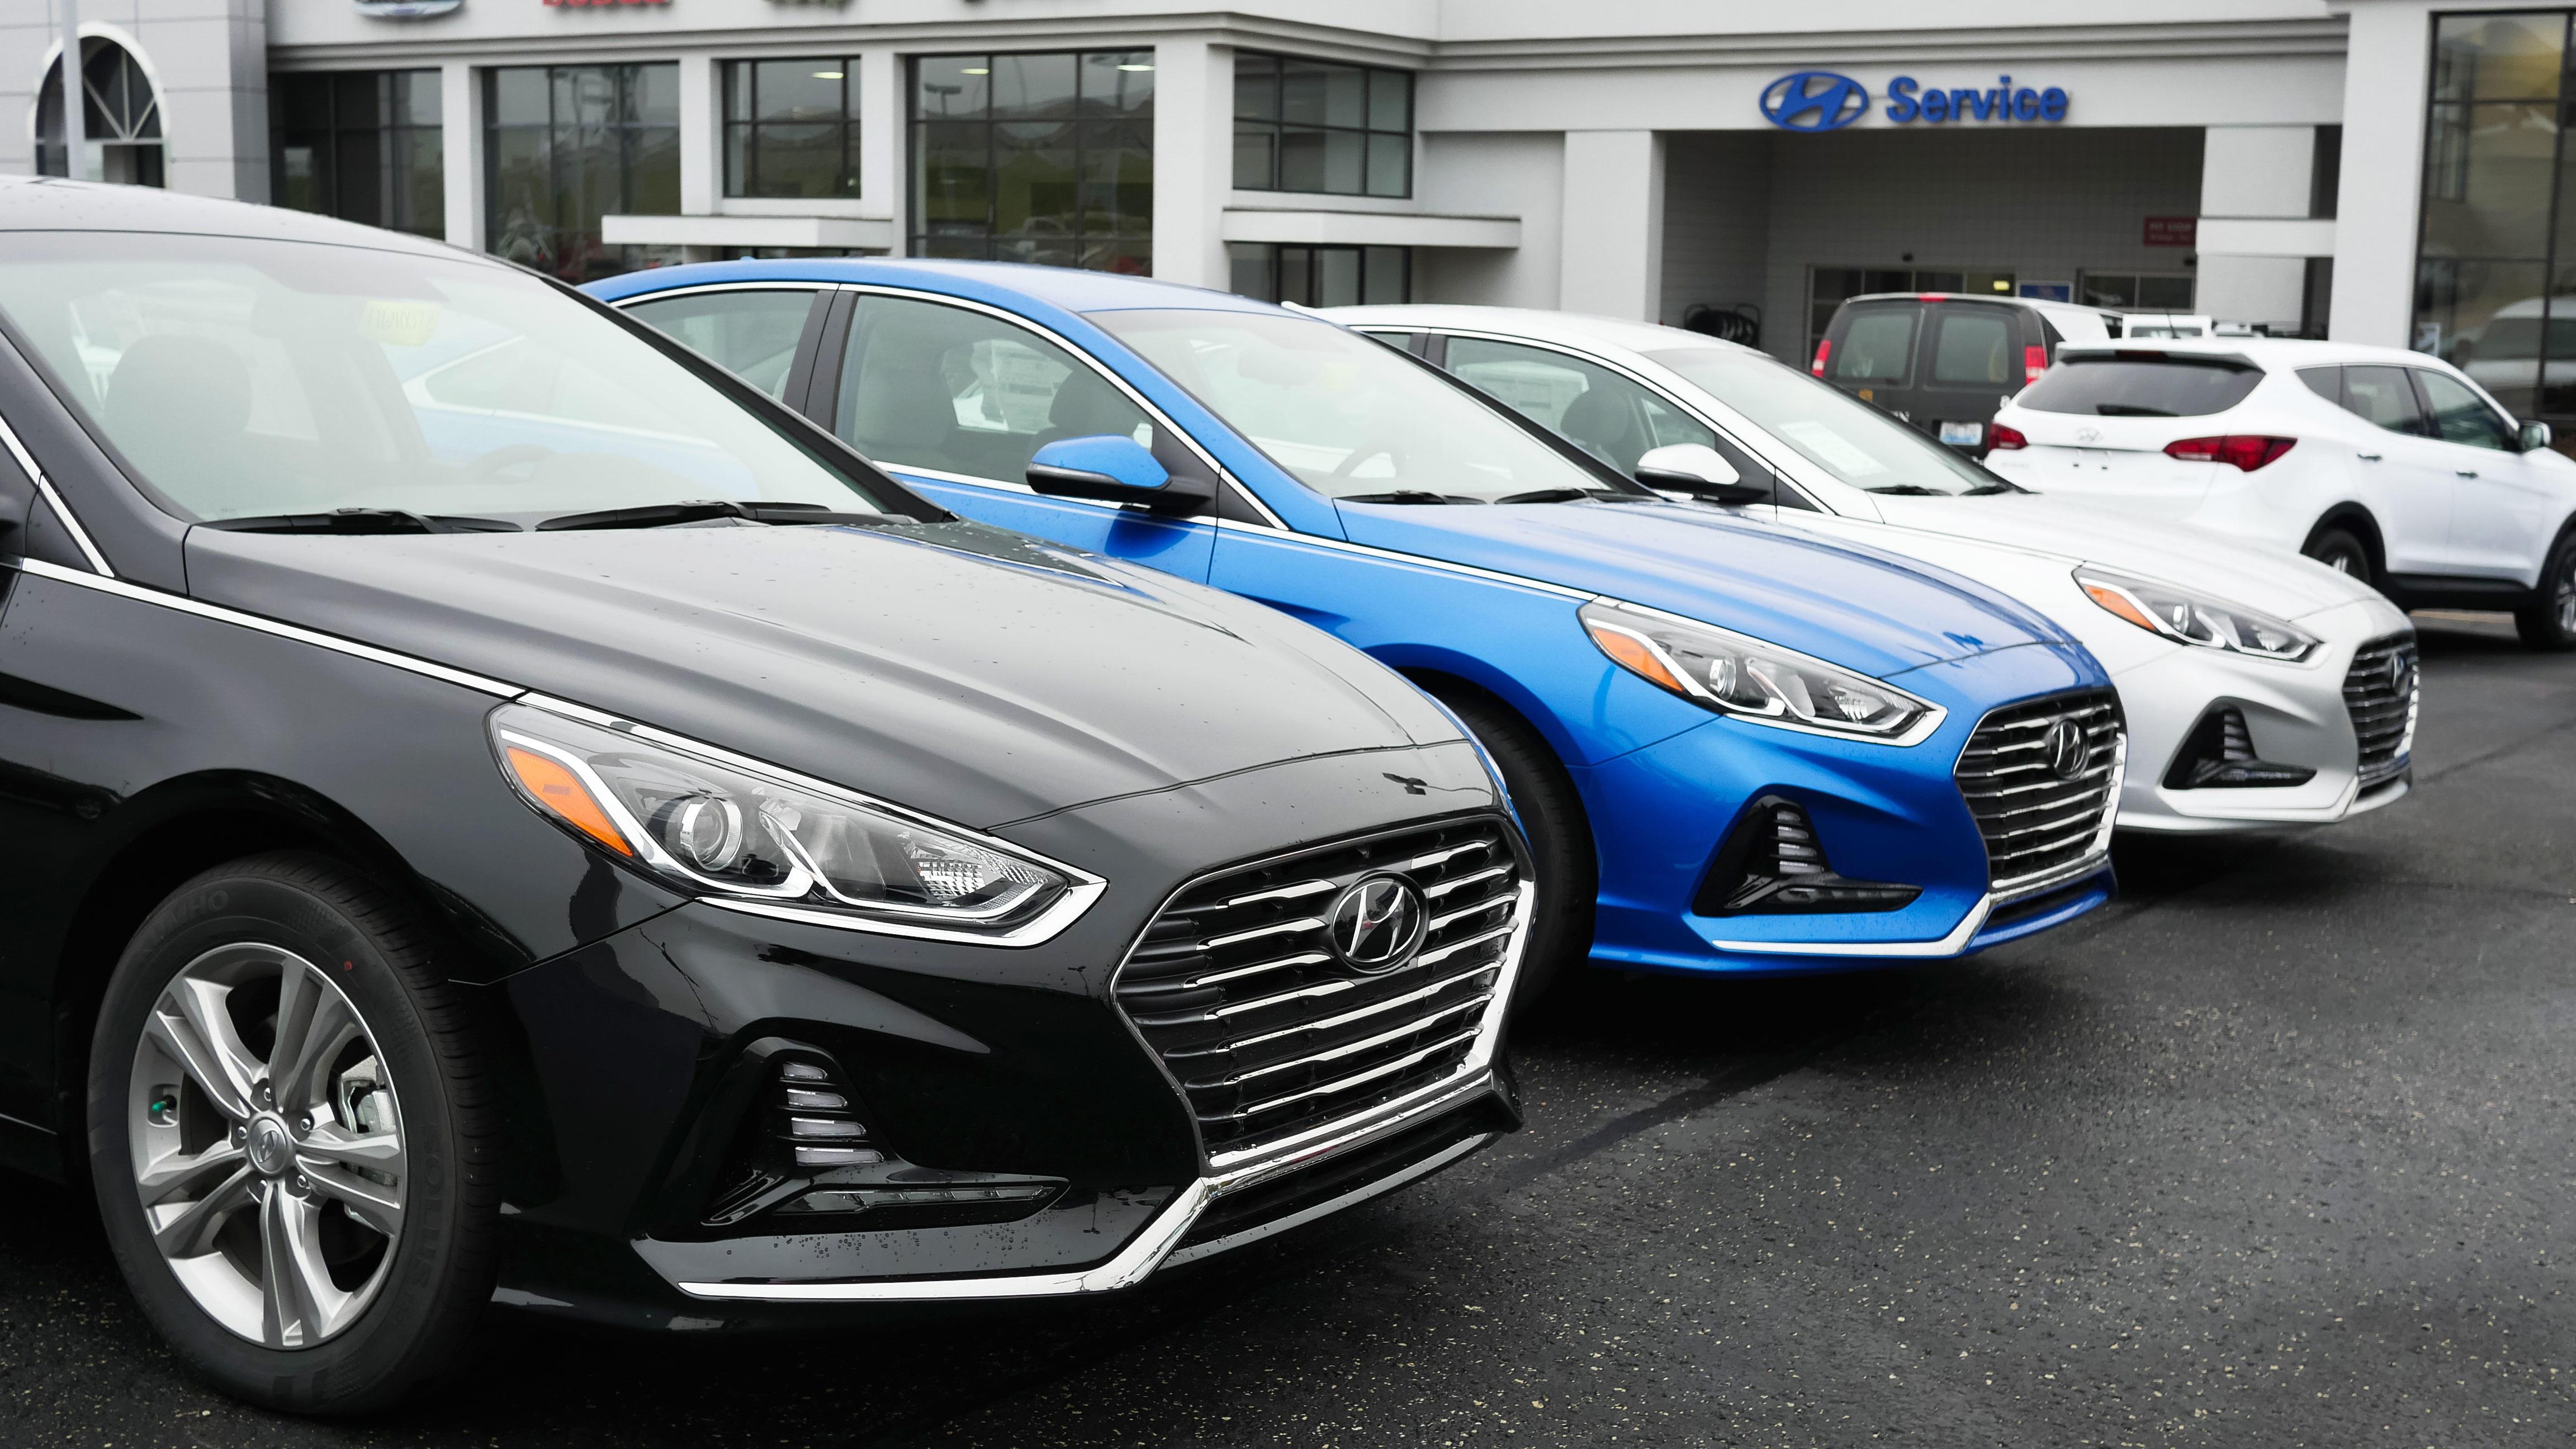 Bachman Hyundai image 6